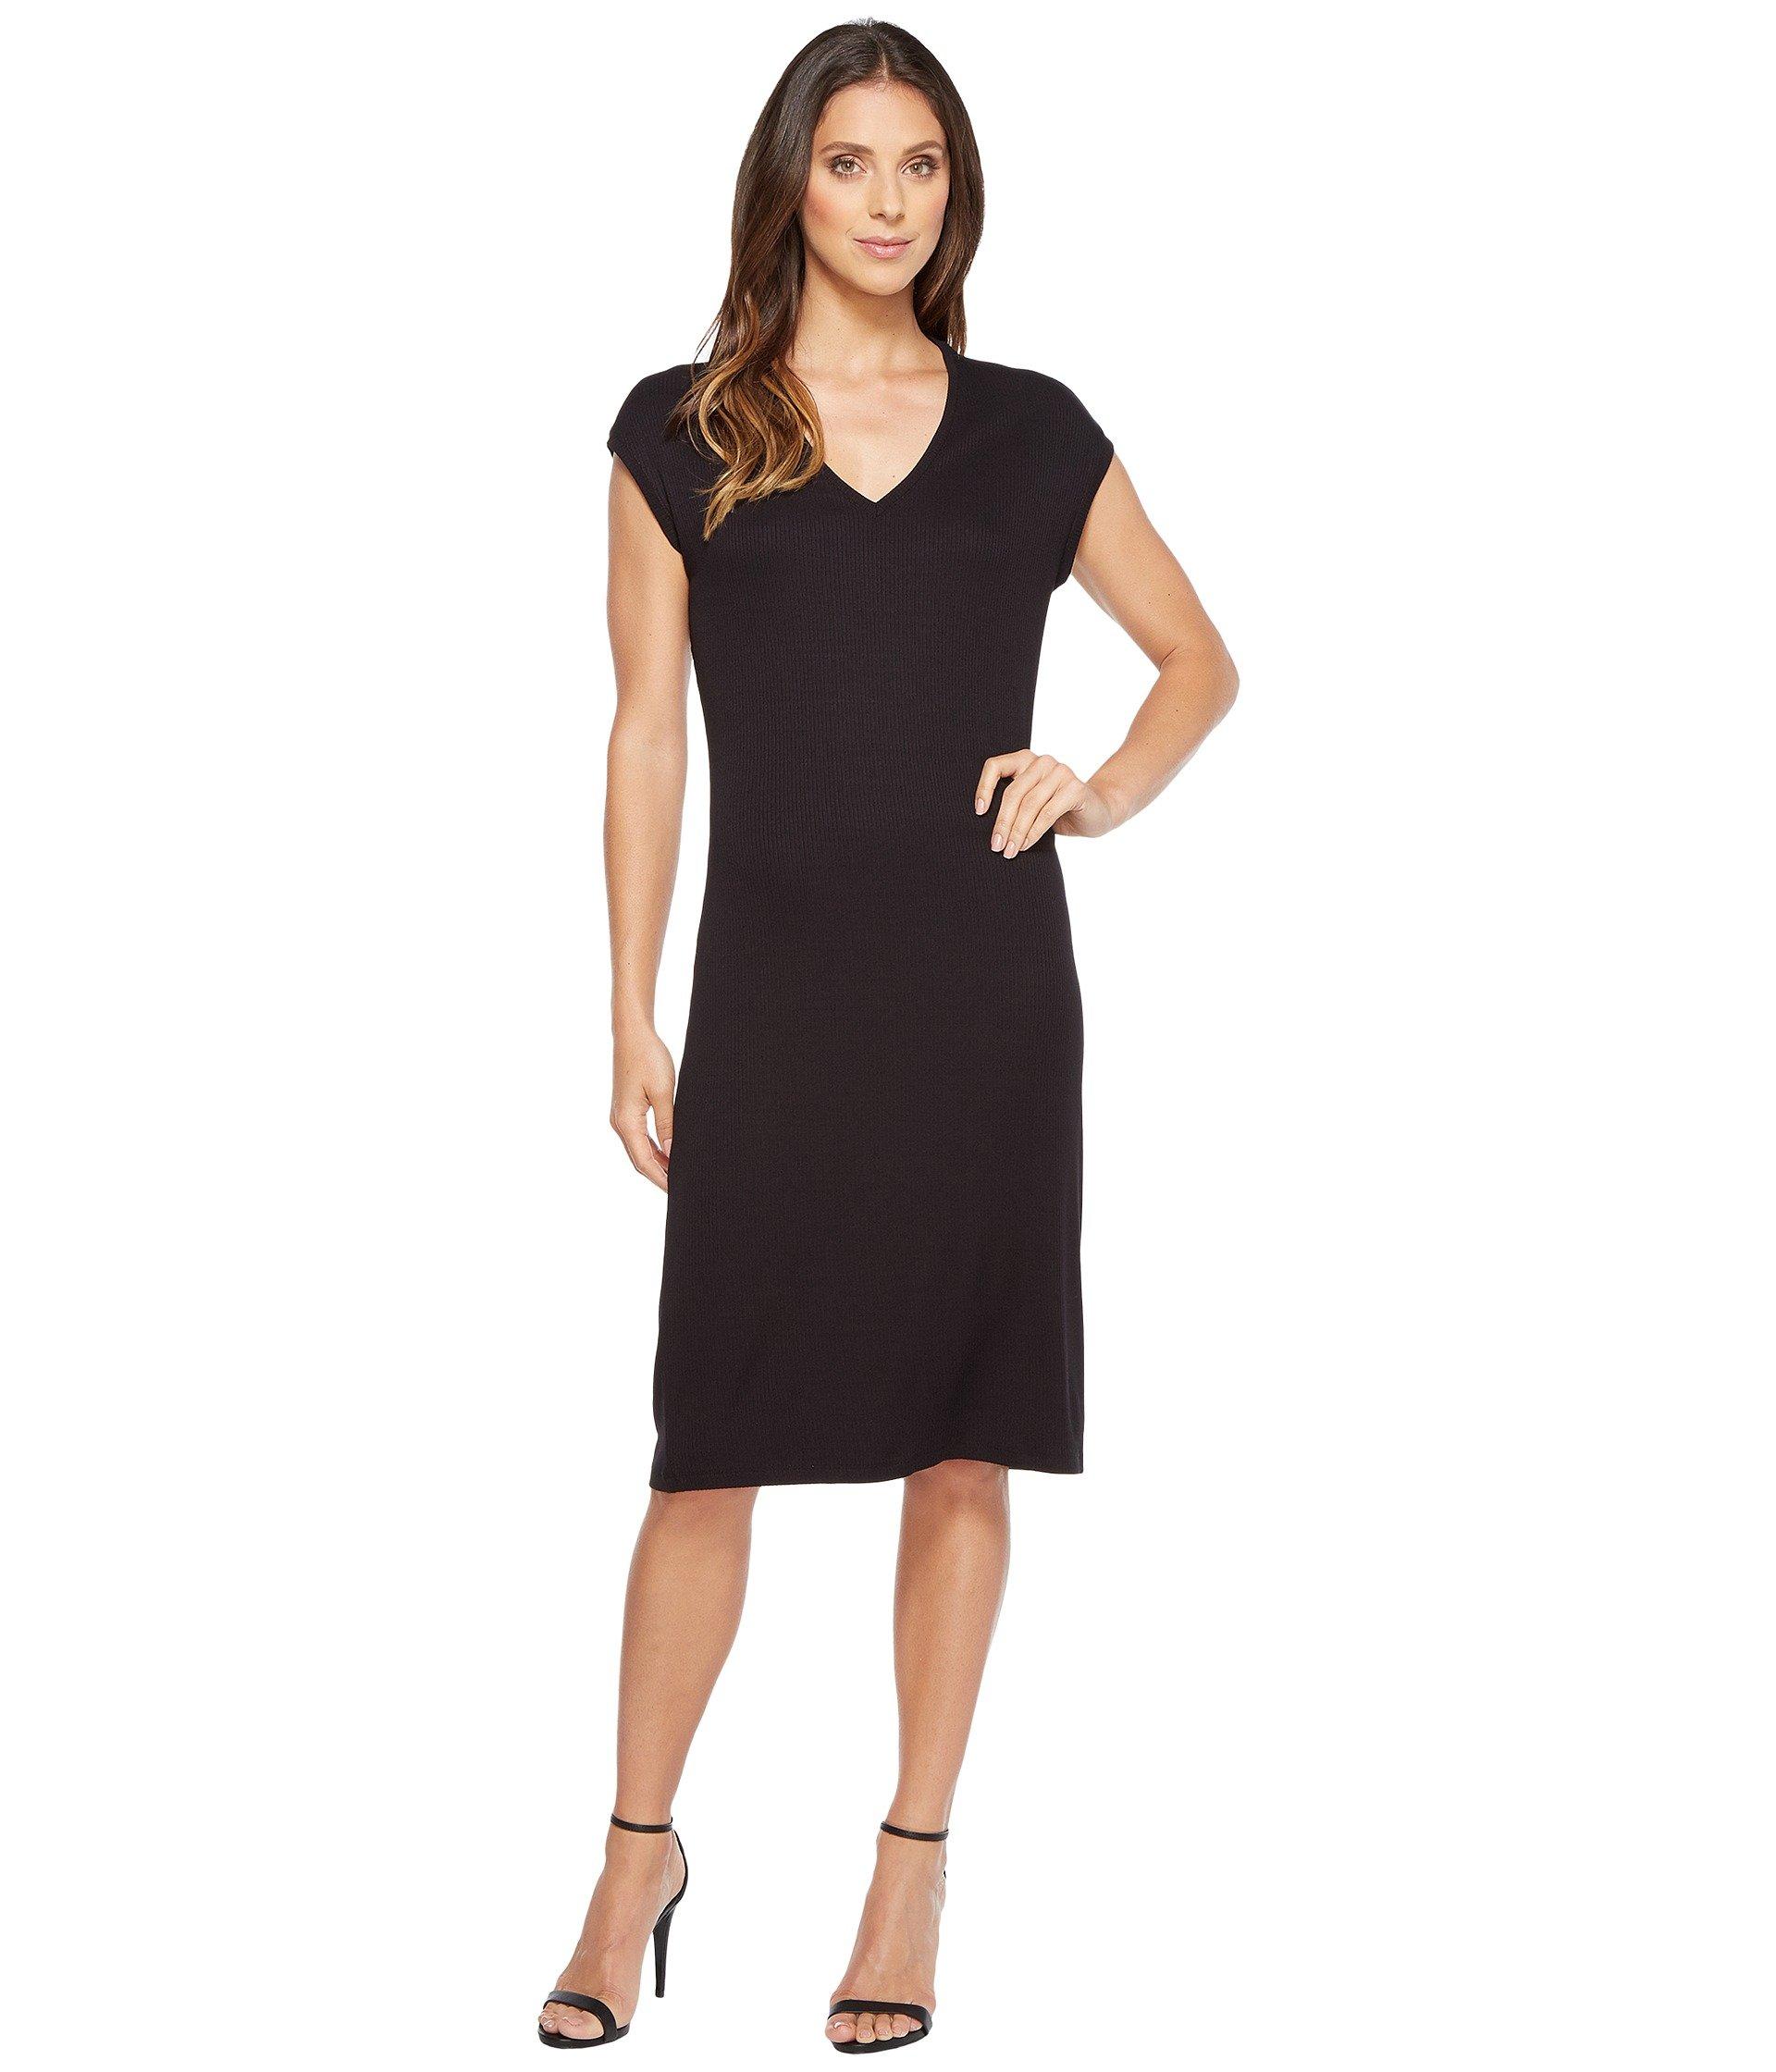 IVANKA TRUMP Short Sleeve Knit Dress, Black